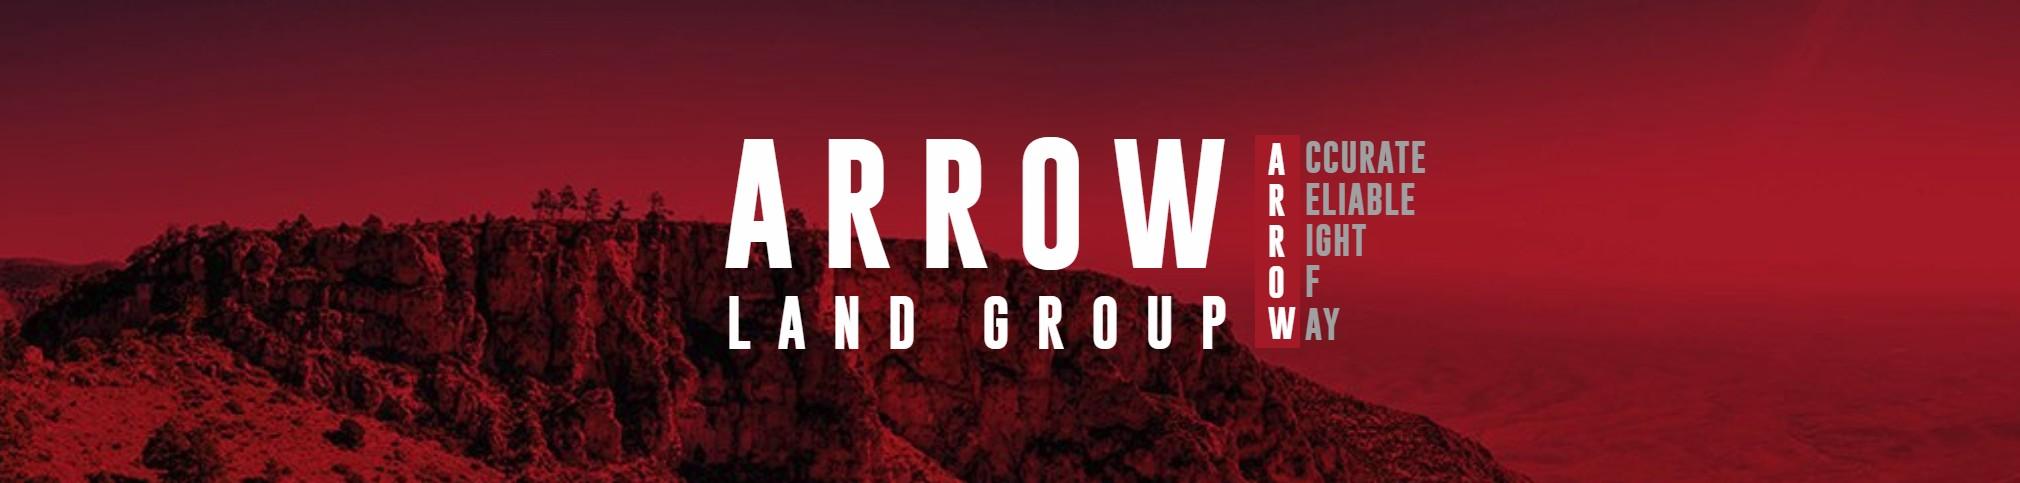 Arrow Land Group, LLC | LinkedIn